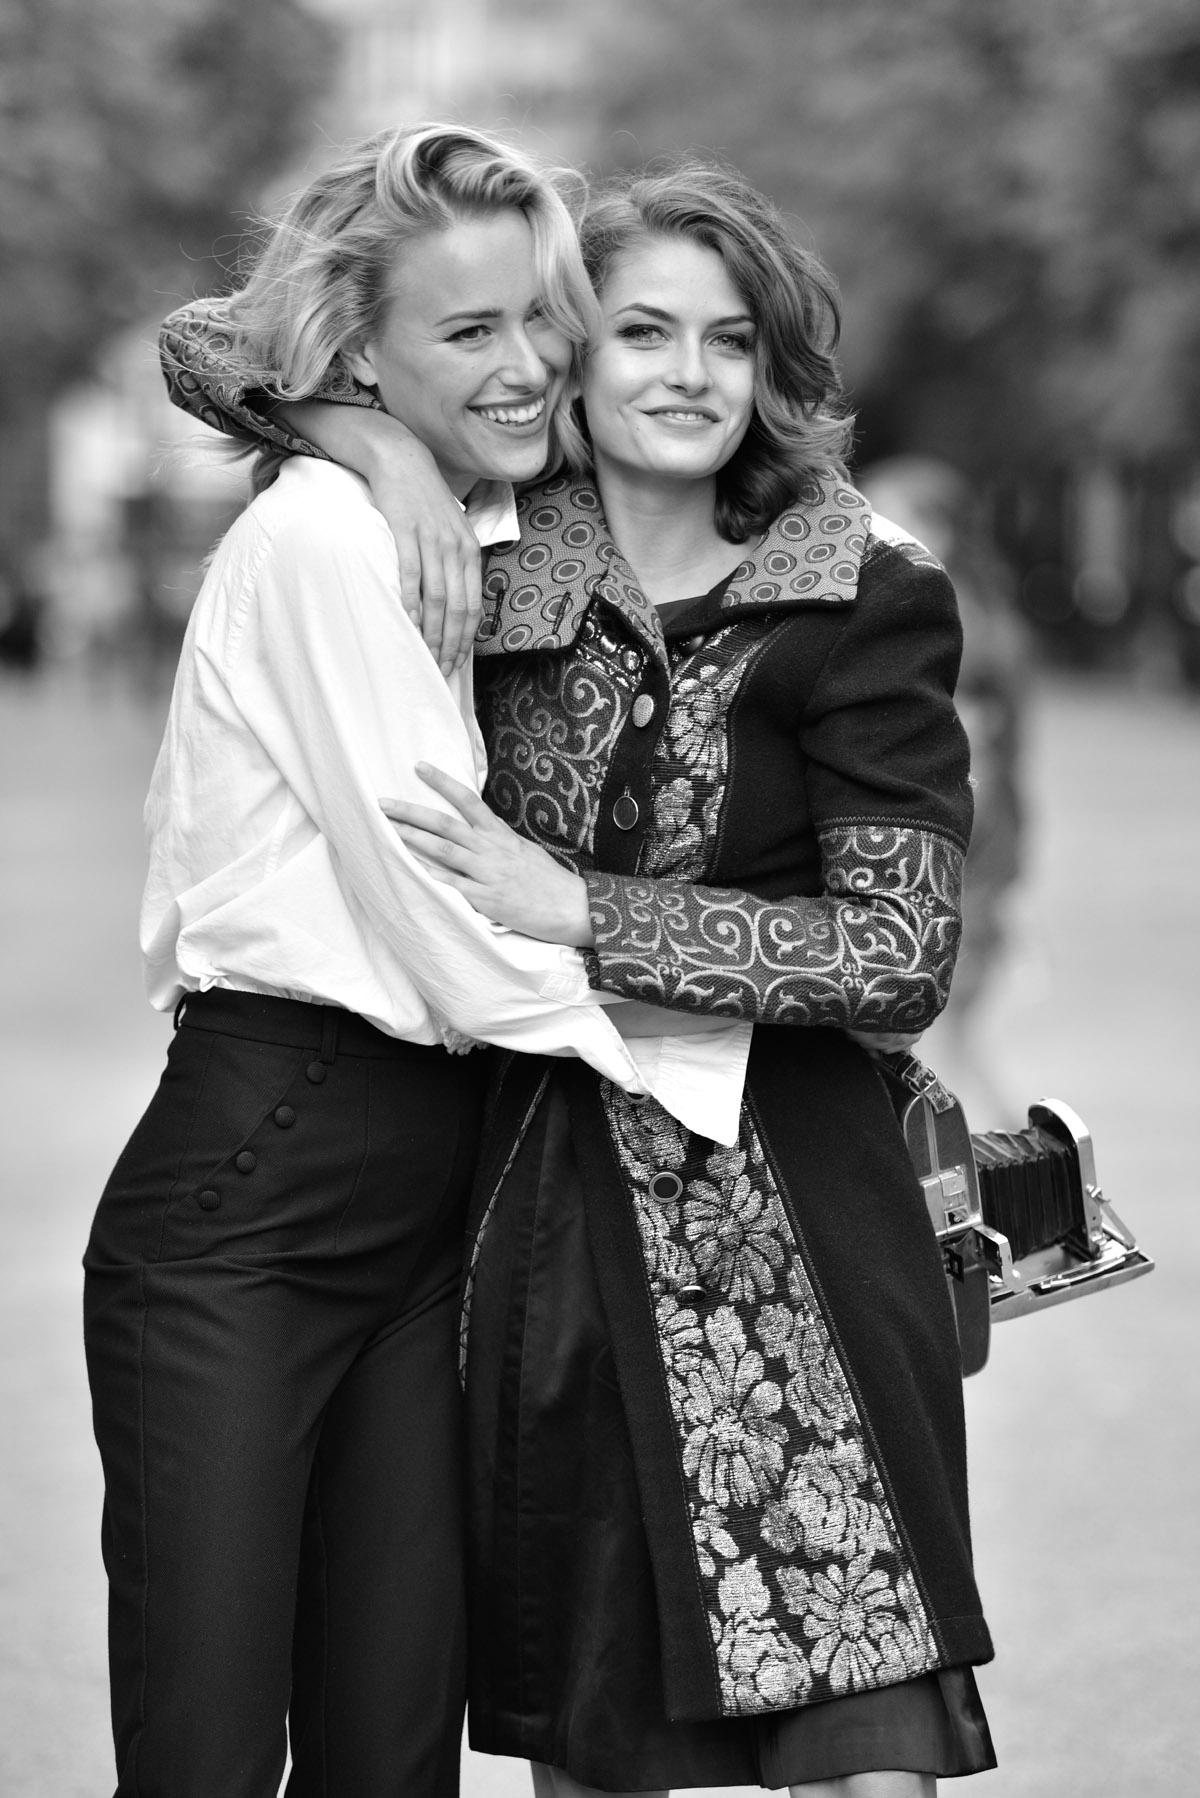 Paris Female couple Editorial - nouvelle Romance homage by Peter Mueller Photography 12